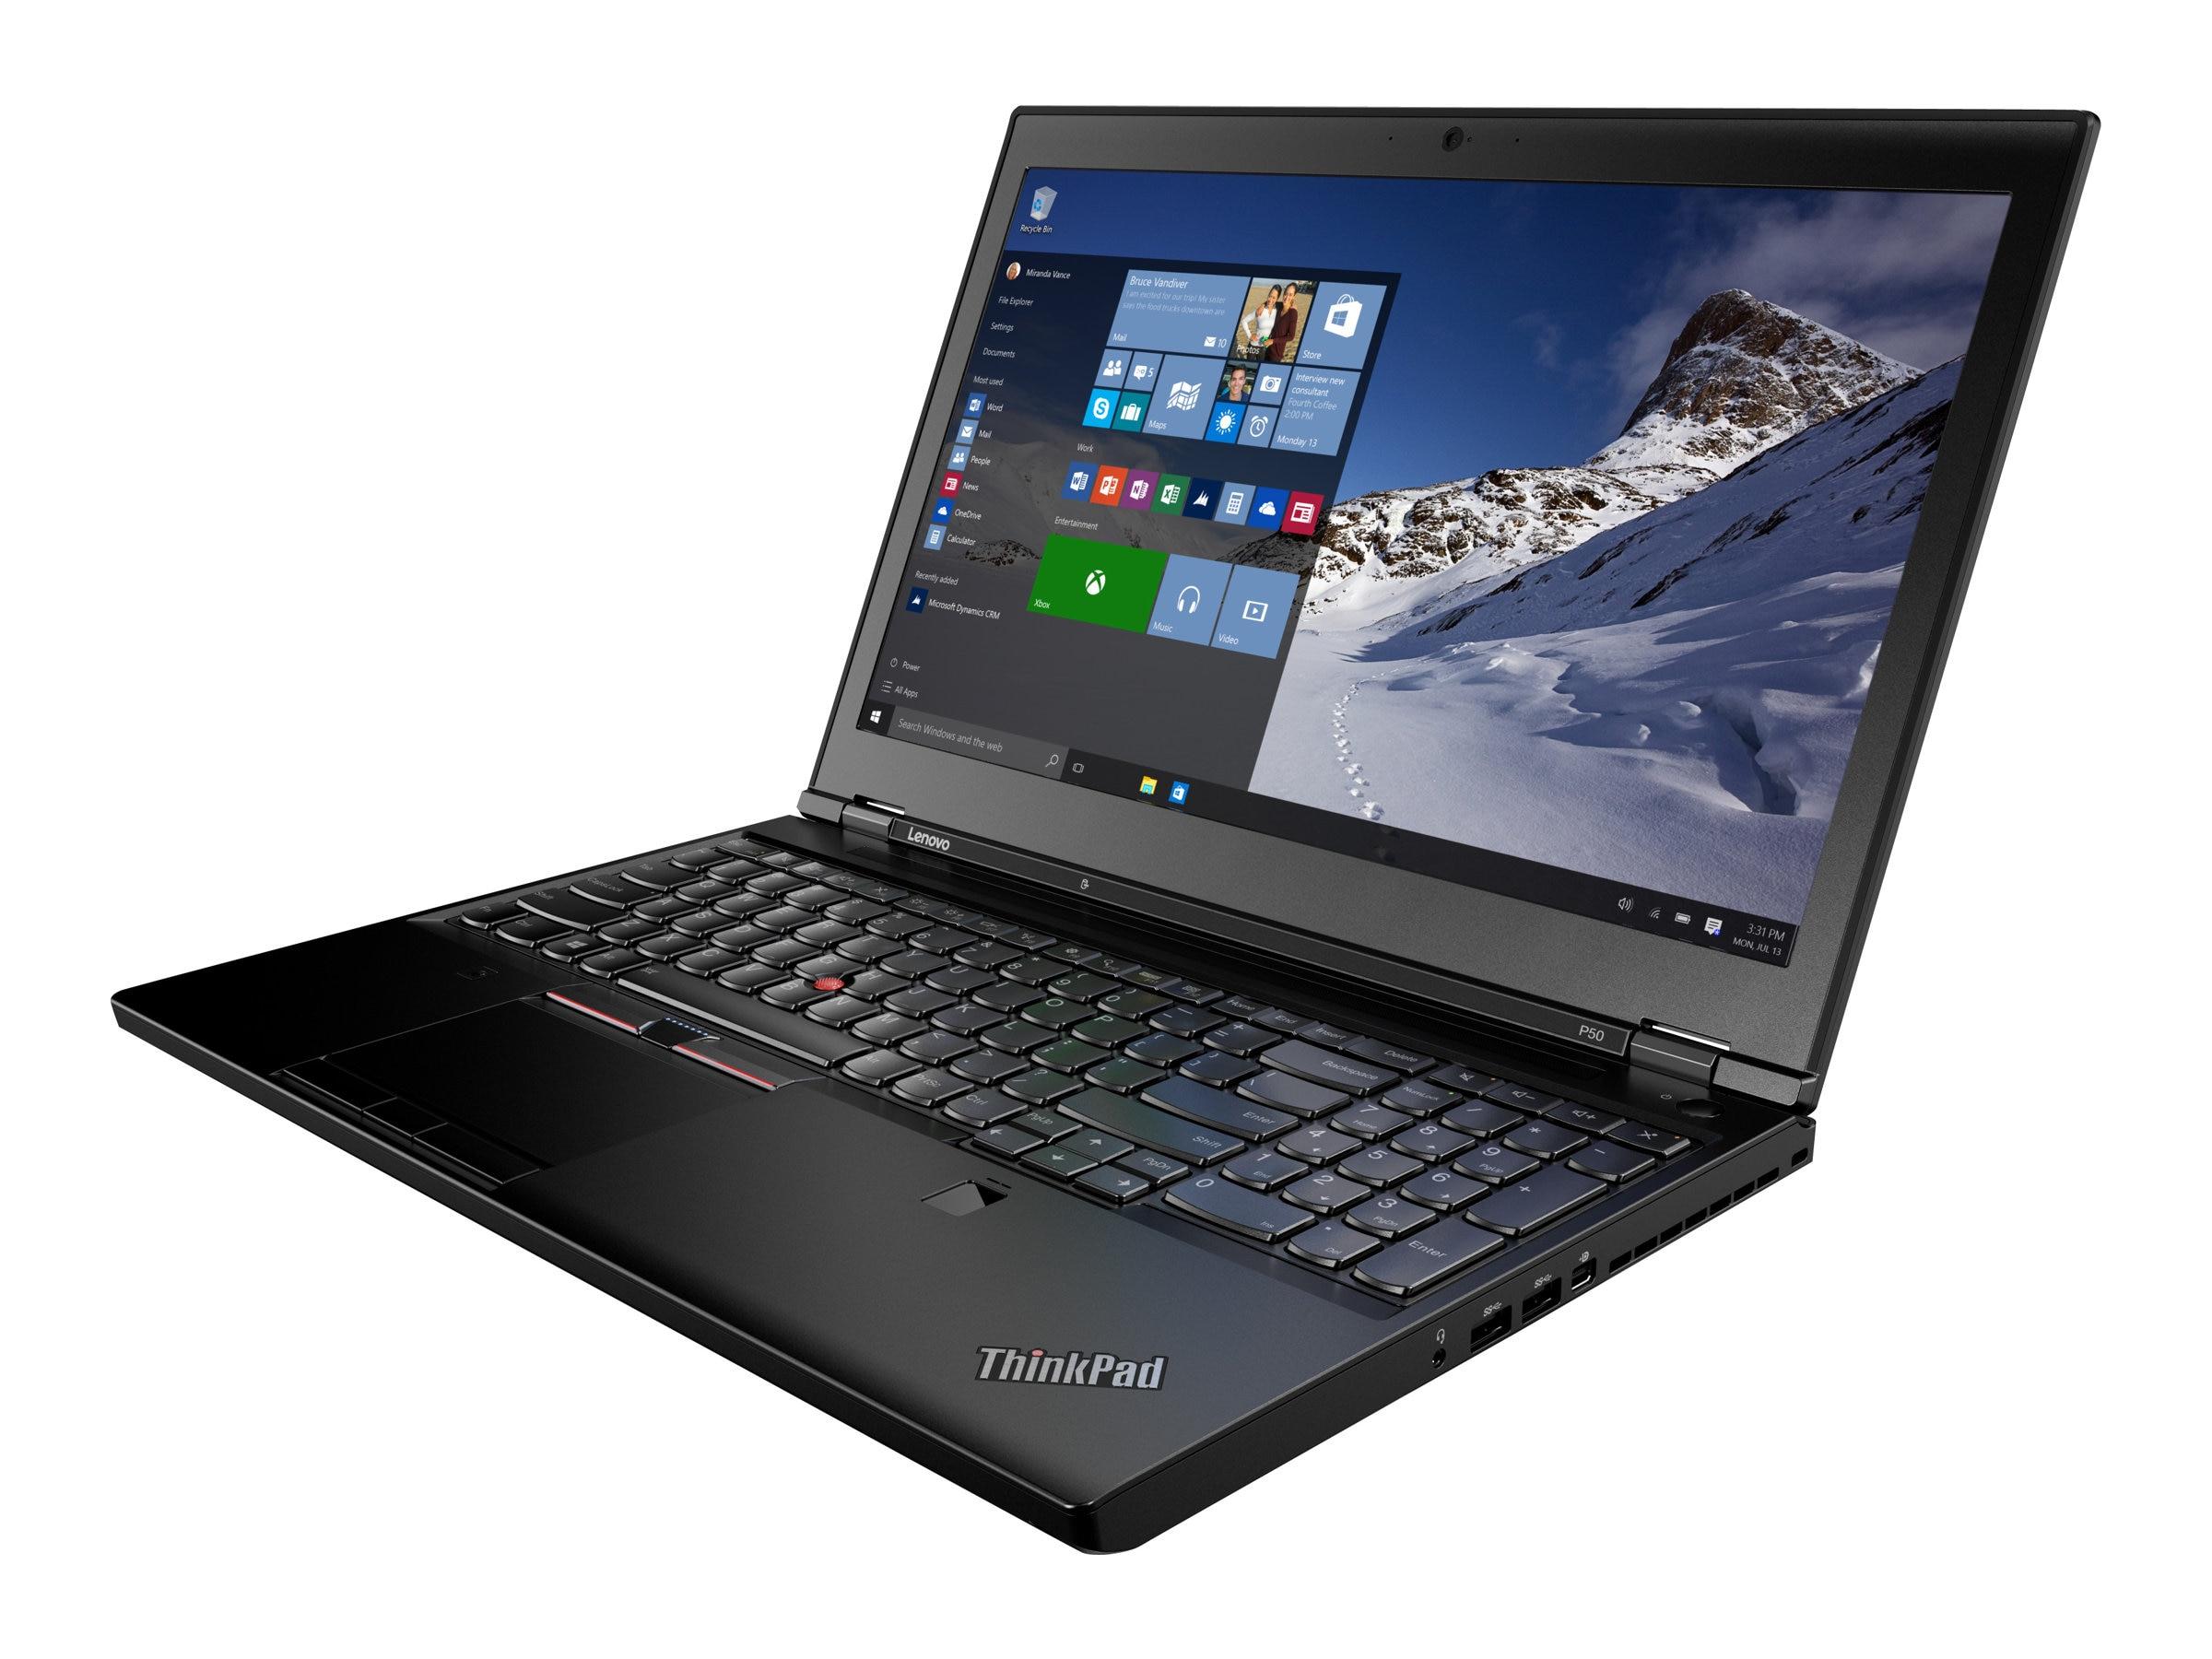 Lenovo TopSeller ThinkPad P50 Core i7-6700HQ 2.6GHz 8GB 500GB ac BT FR 6C M1000M 15.6 FHD W7P64-W10P, 20EN0013US, 30922364, Workstations - Mobile